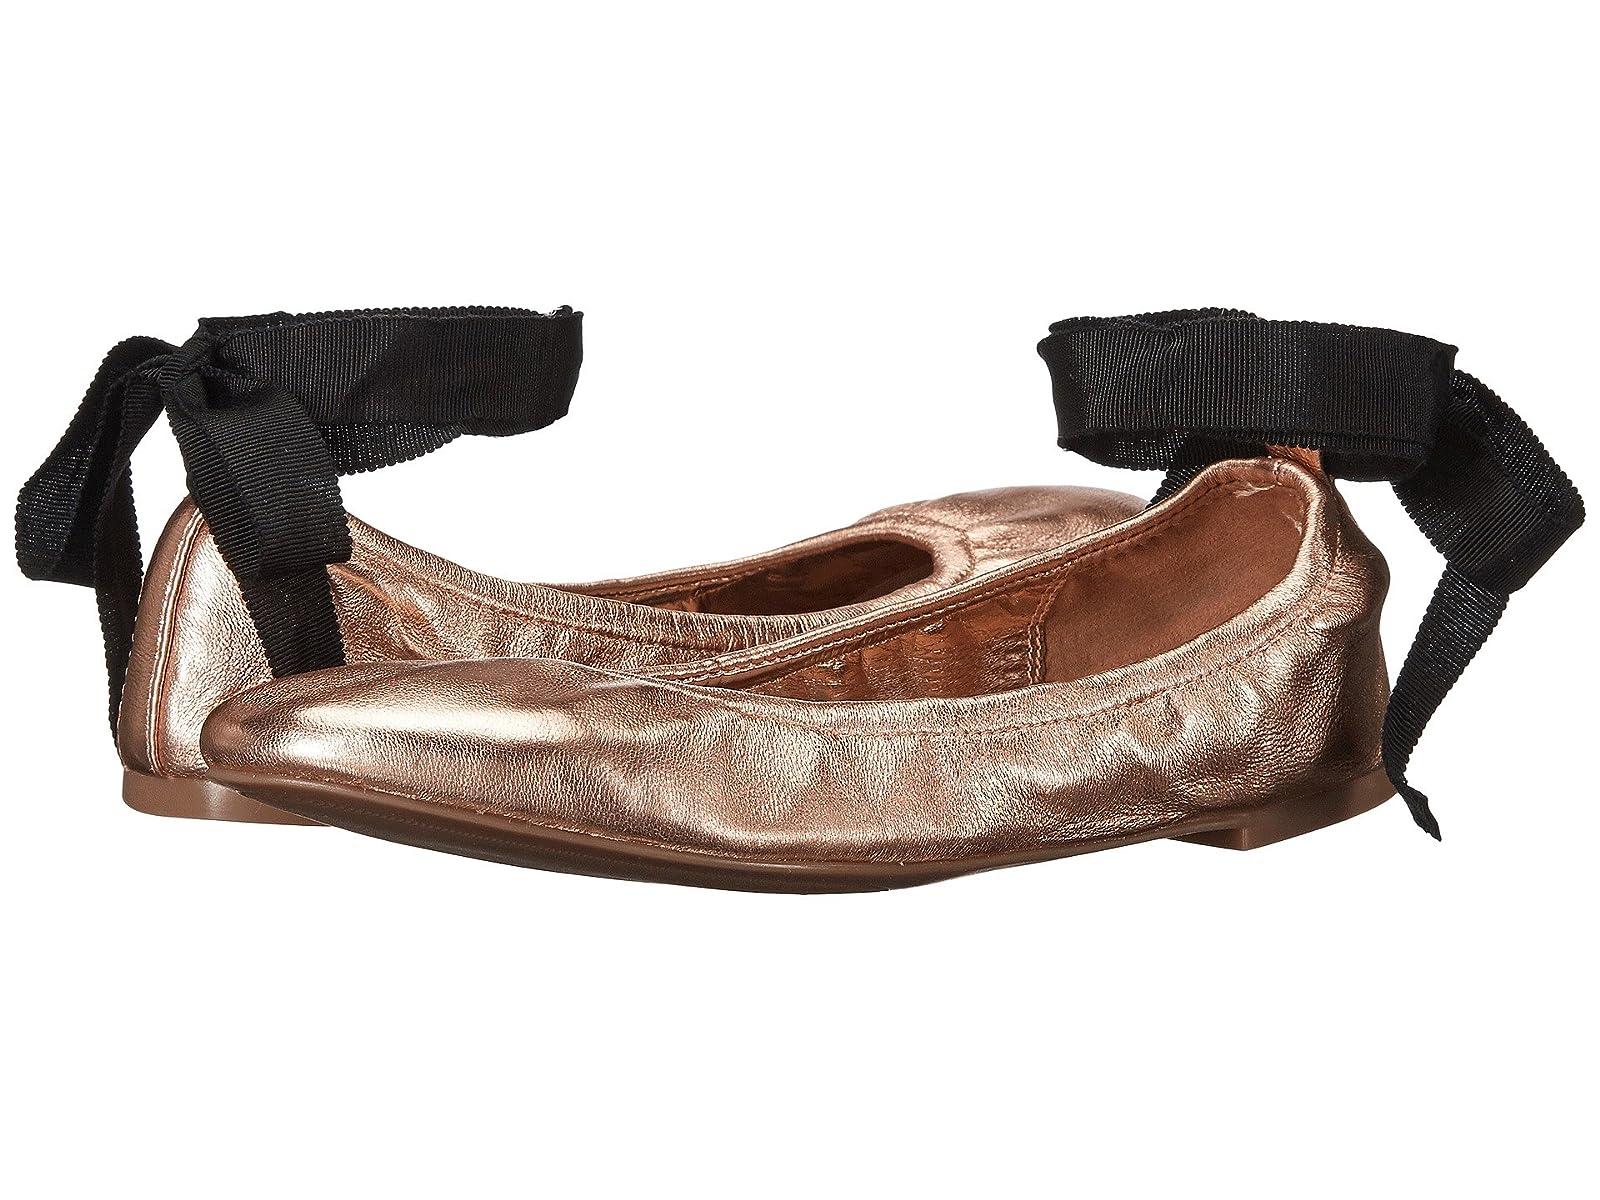 ALDO PhayCheap and distinctive eye-catching shoes